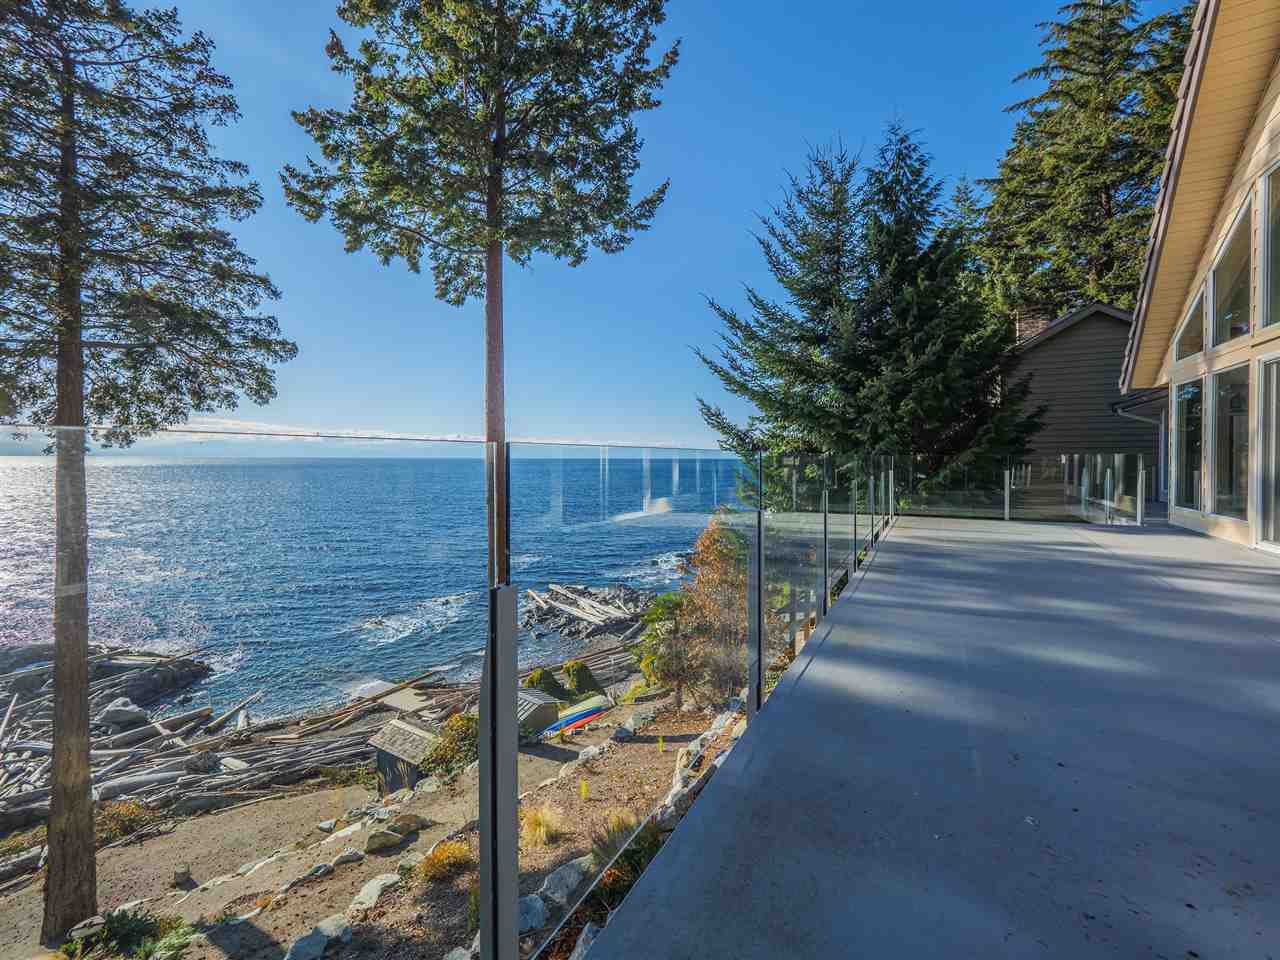 "Photo 3: Photos: 7101 DALE Road in Sechelt: Sechelt District House for sale in ""Caleda Estates"" (Sunshine Coast)  : MLS®# R2515160"